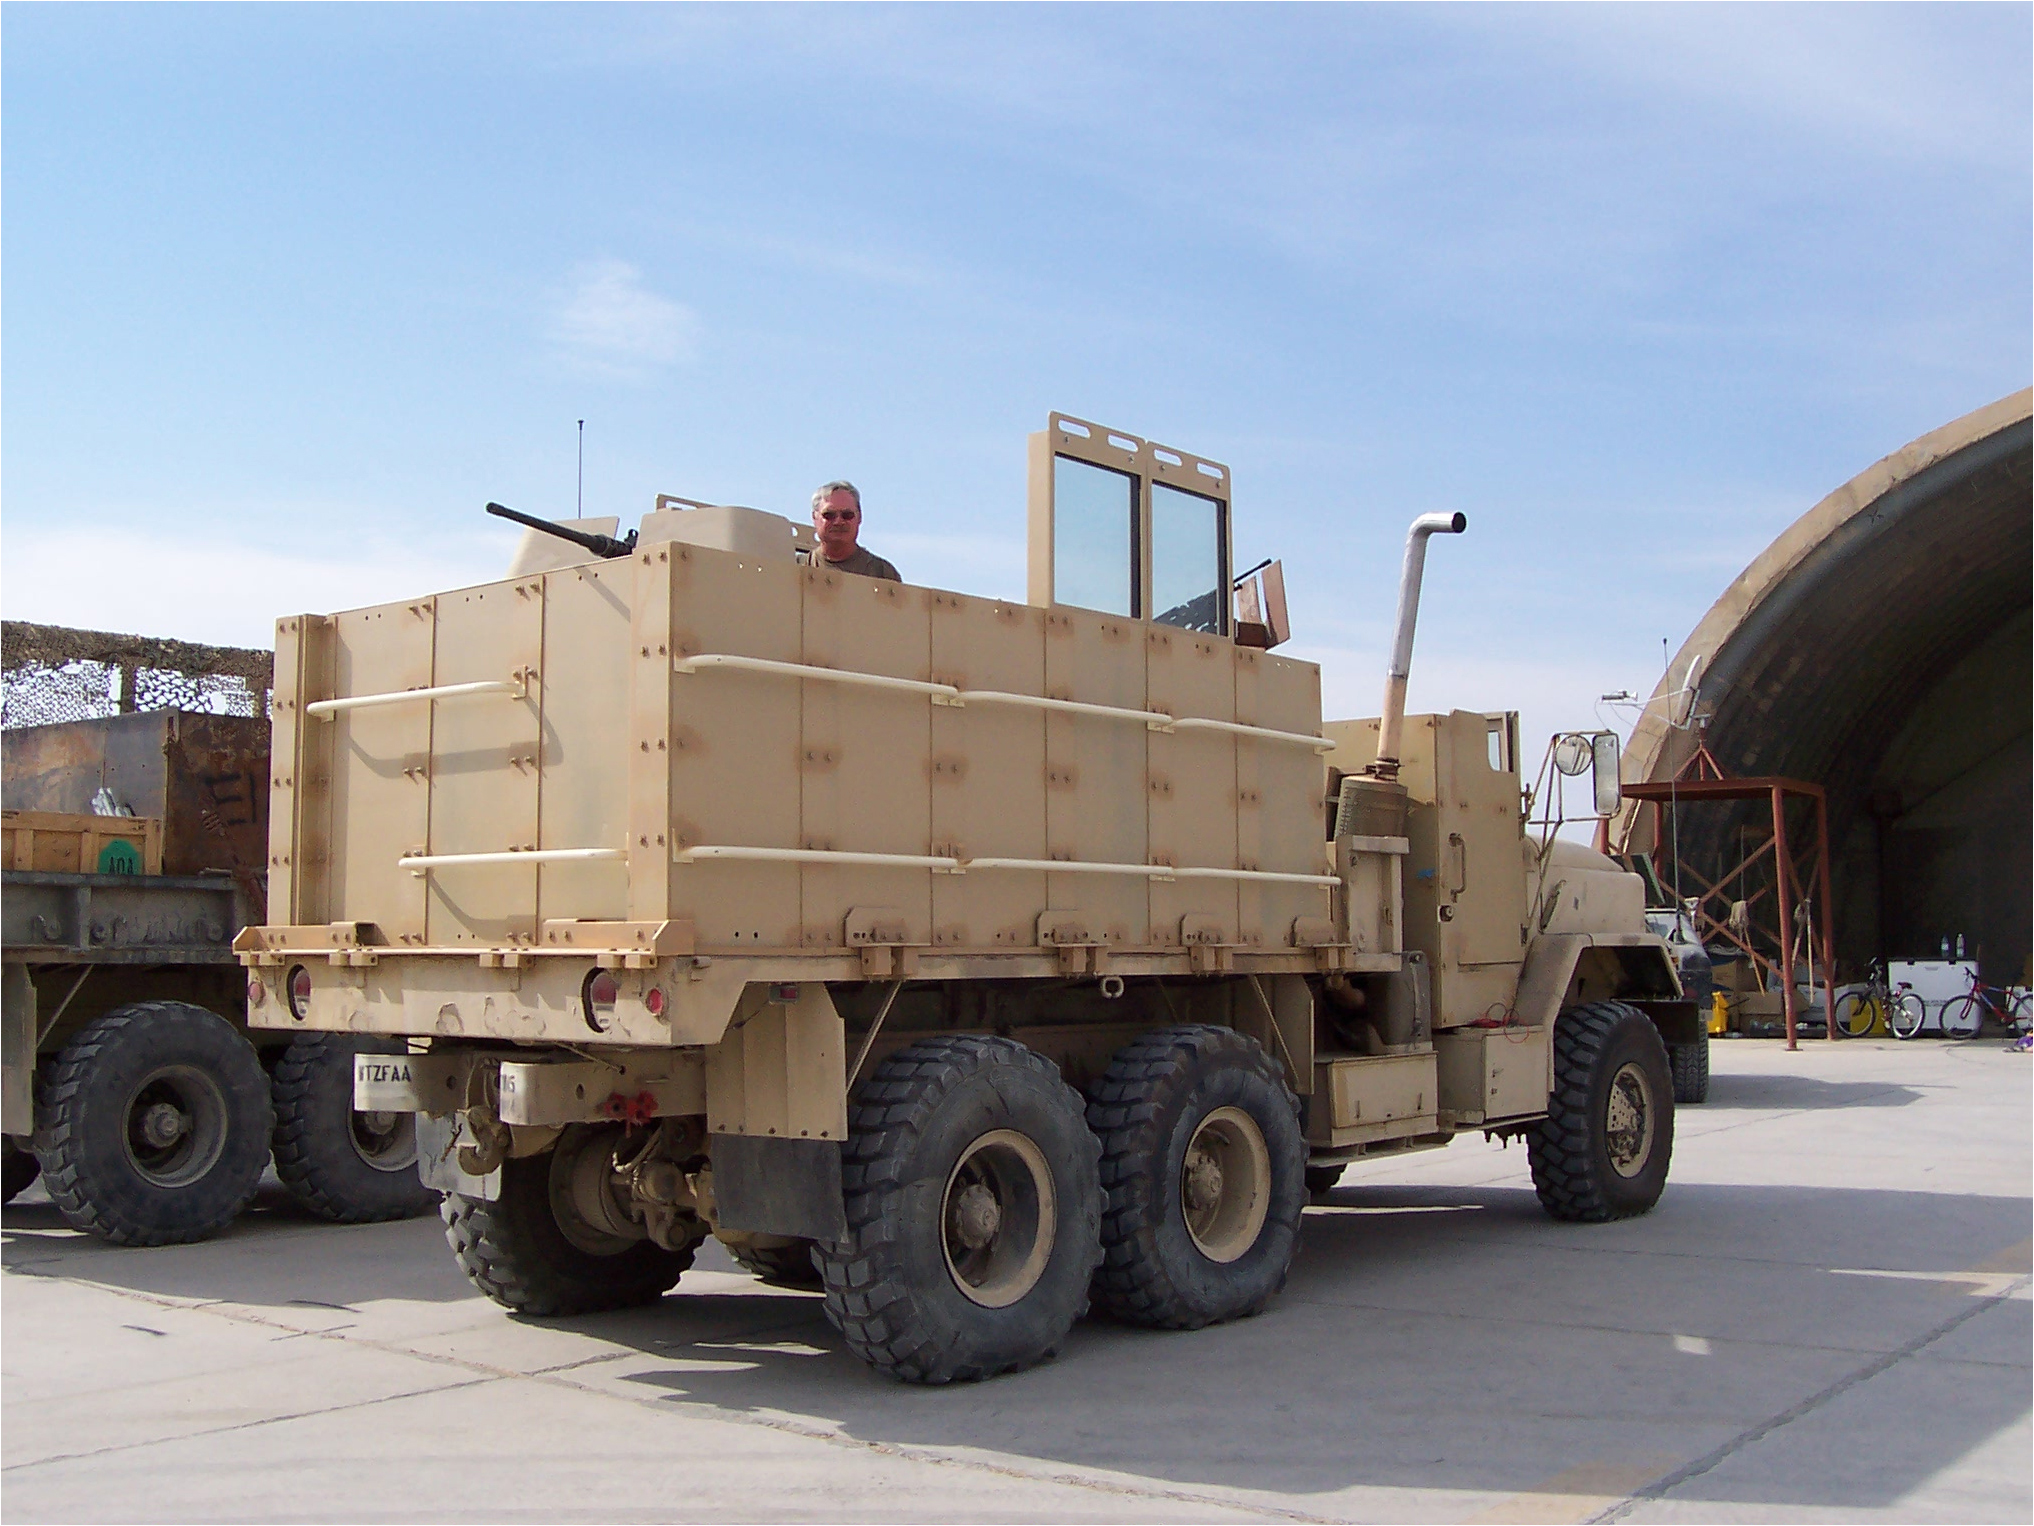 Gun truck - Wikipedia